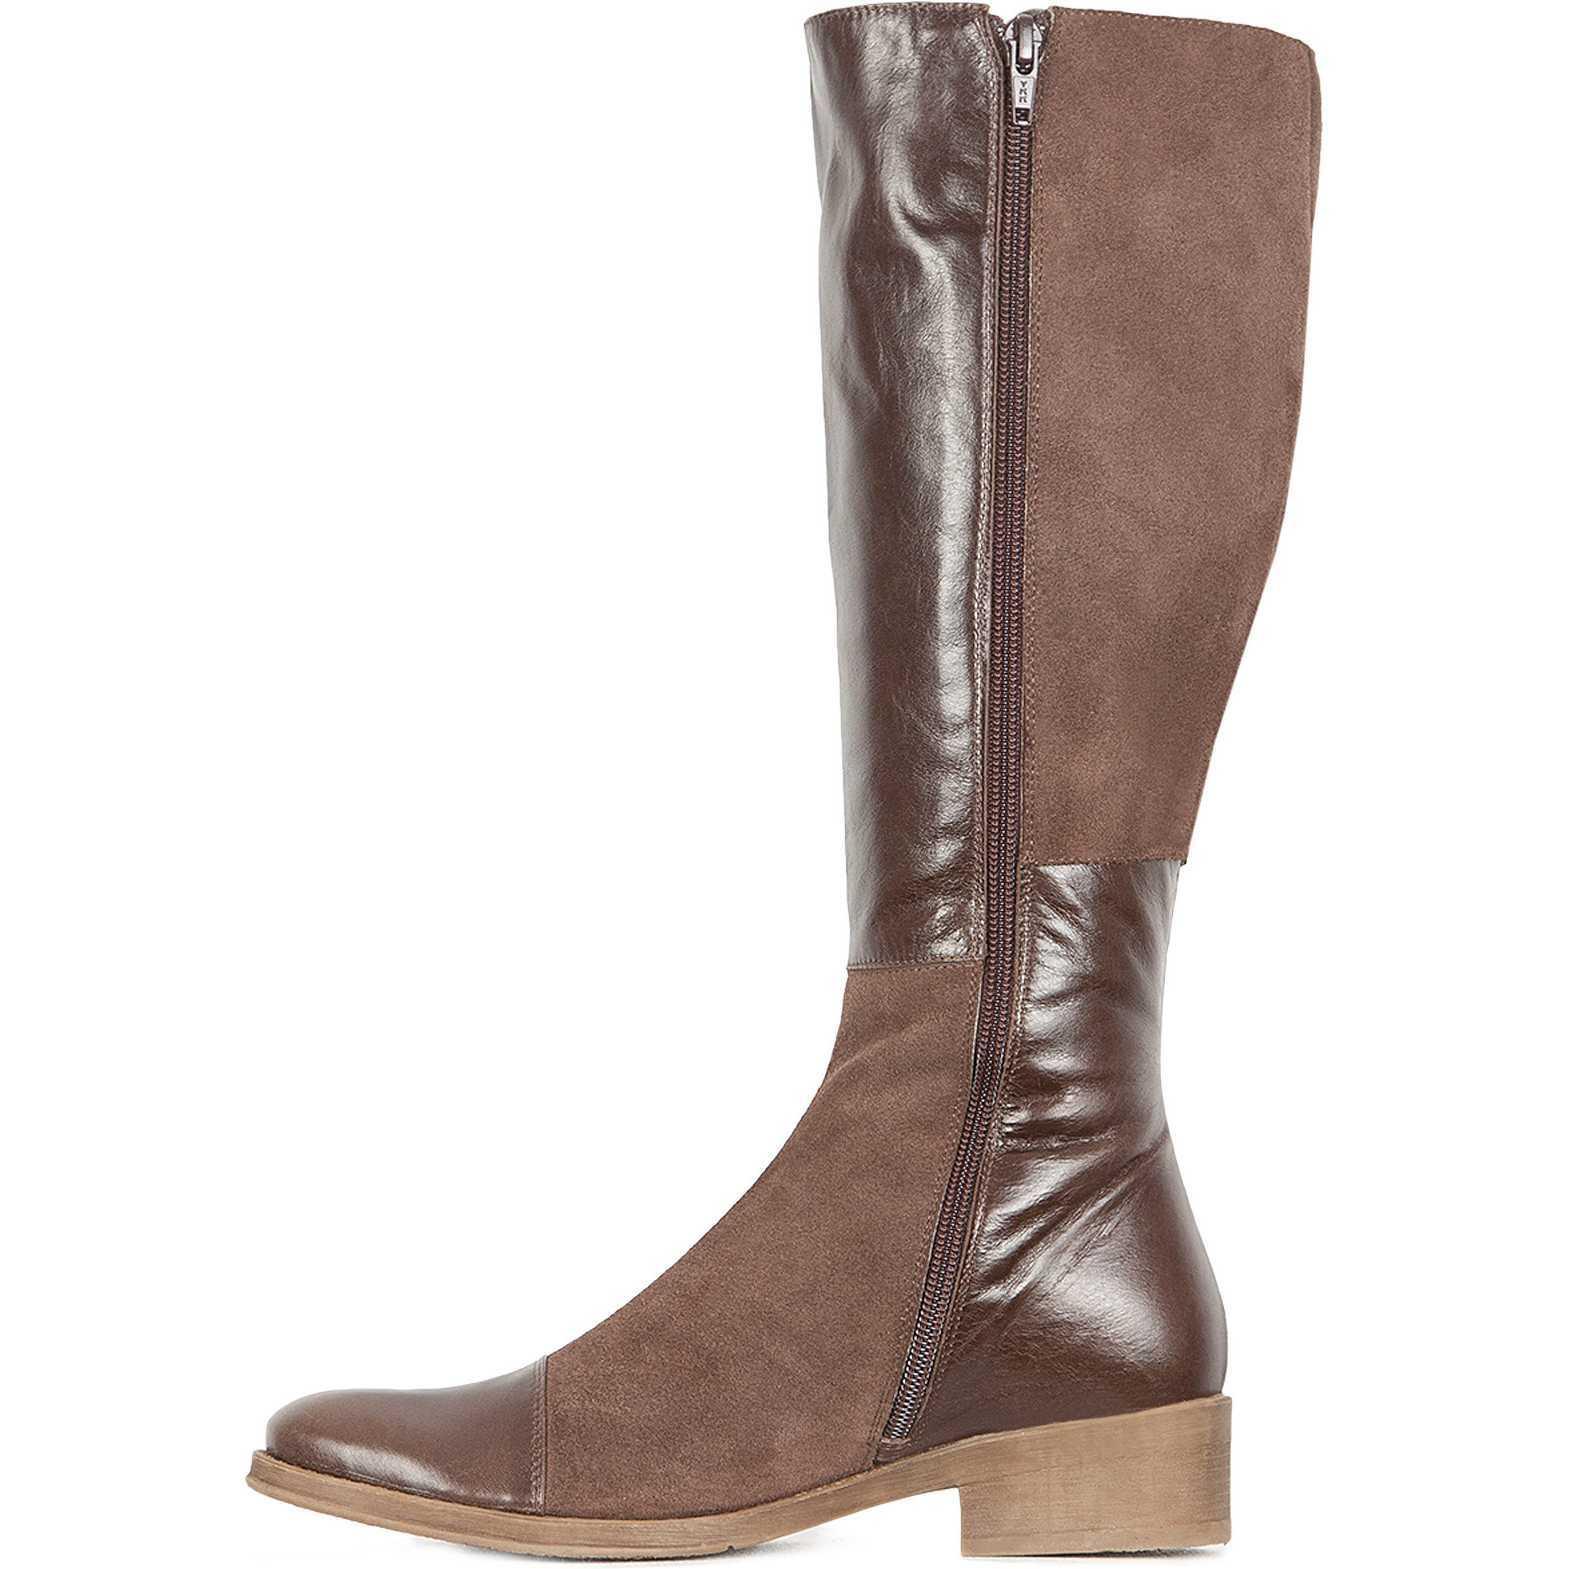 Reduceri cizme femei din piele naturala brand Ecco